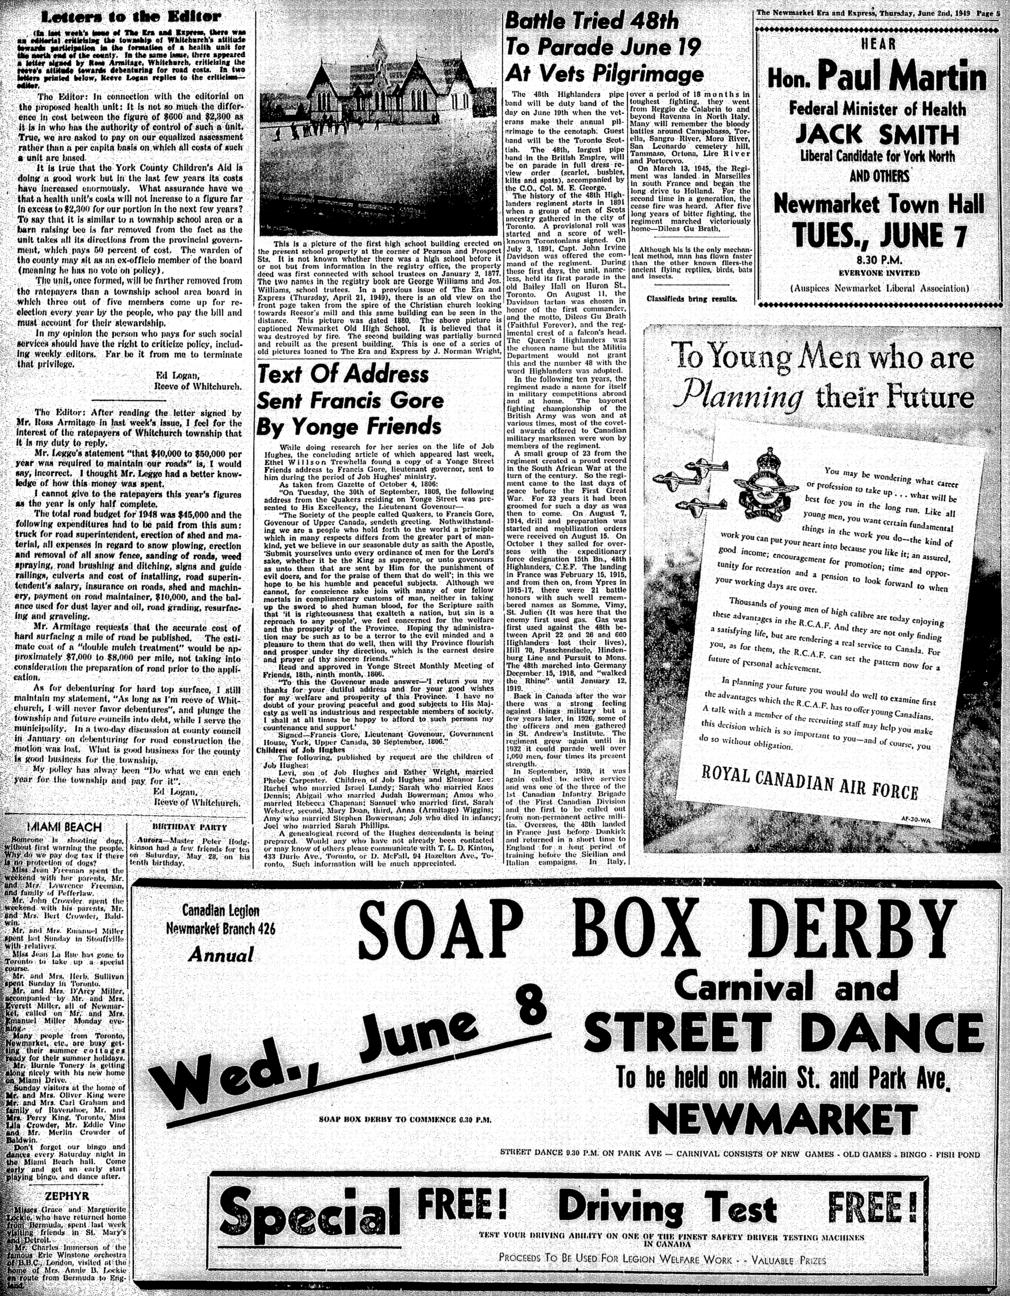 Newmarket Era and Express (Newmarket, ON), June 2, 1949